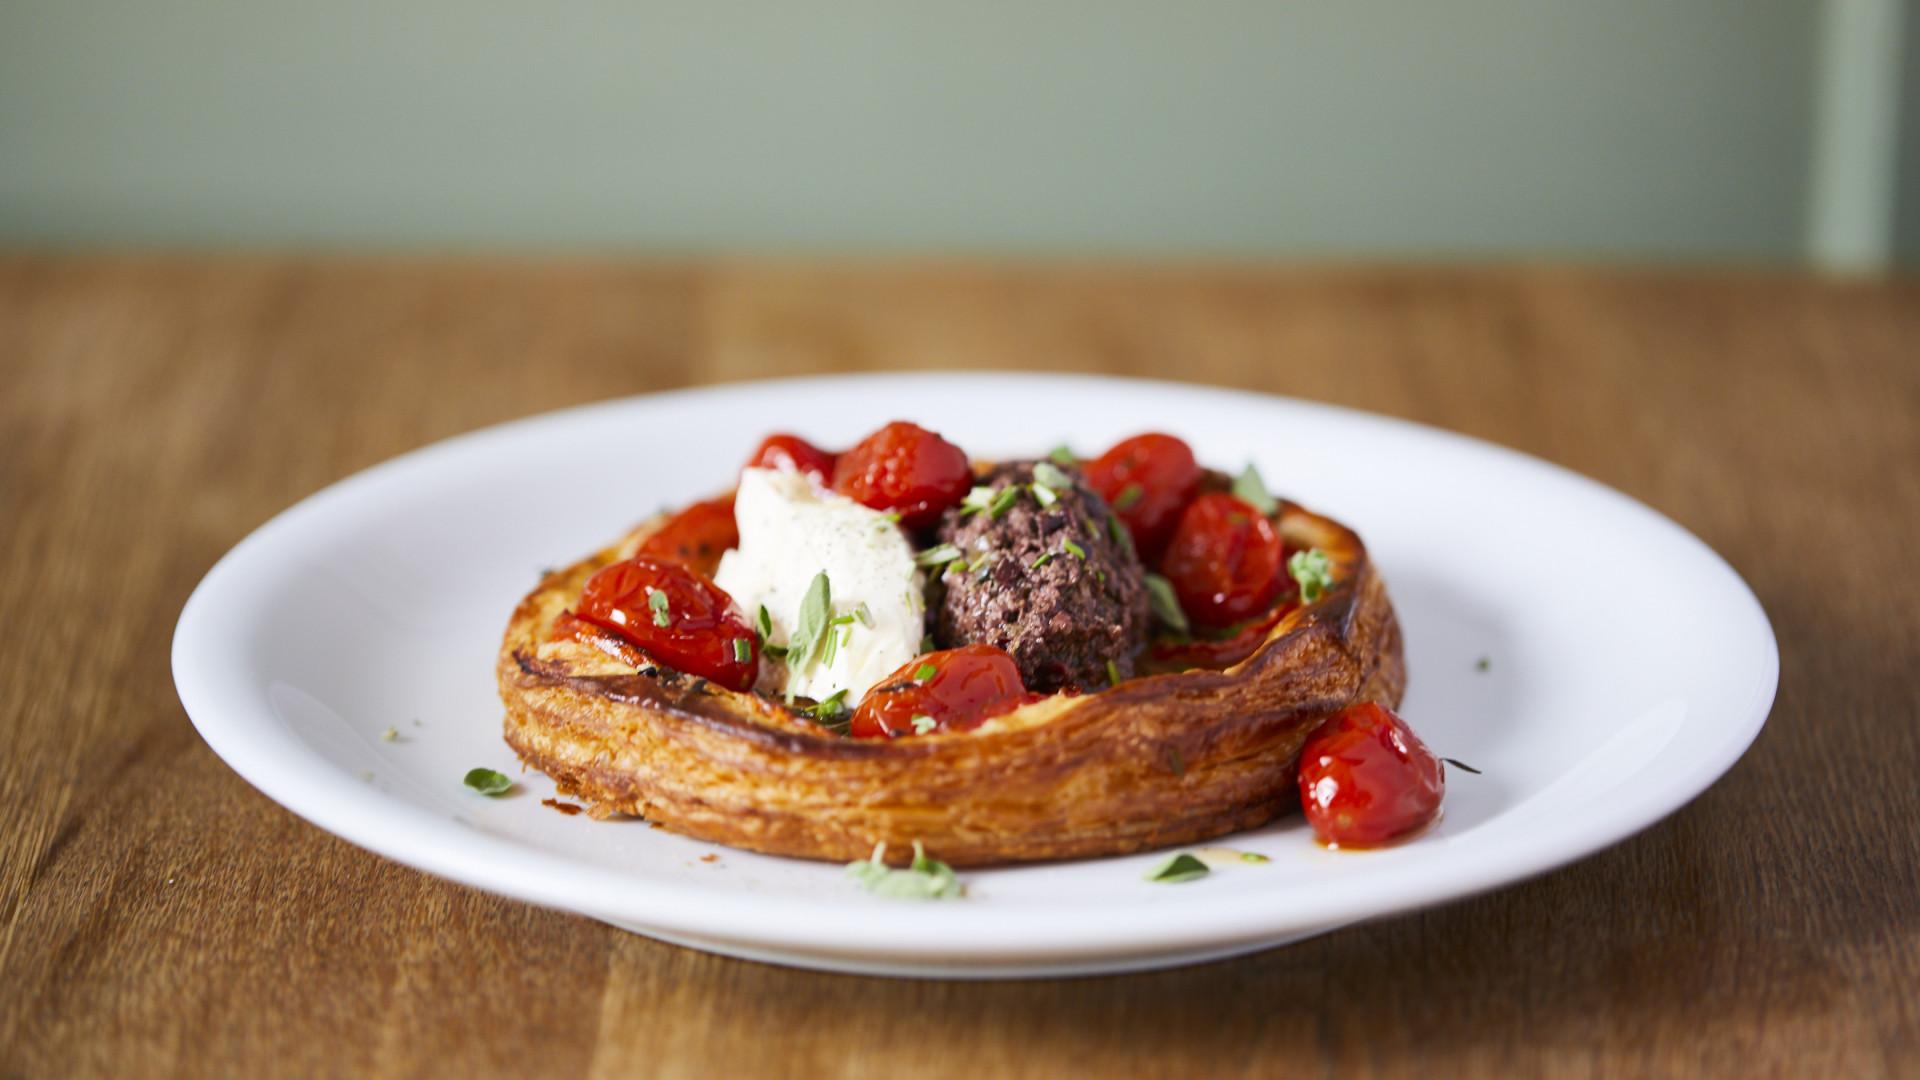 Confit tomato tarte fine at The Duke of Richmond in Hackney